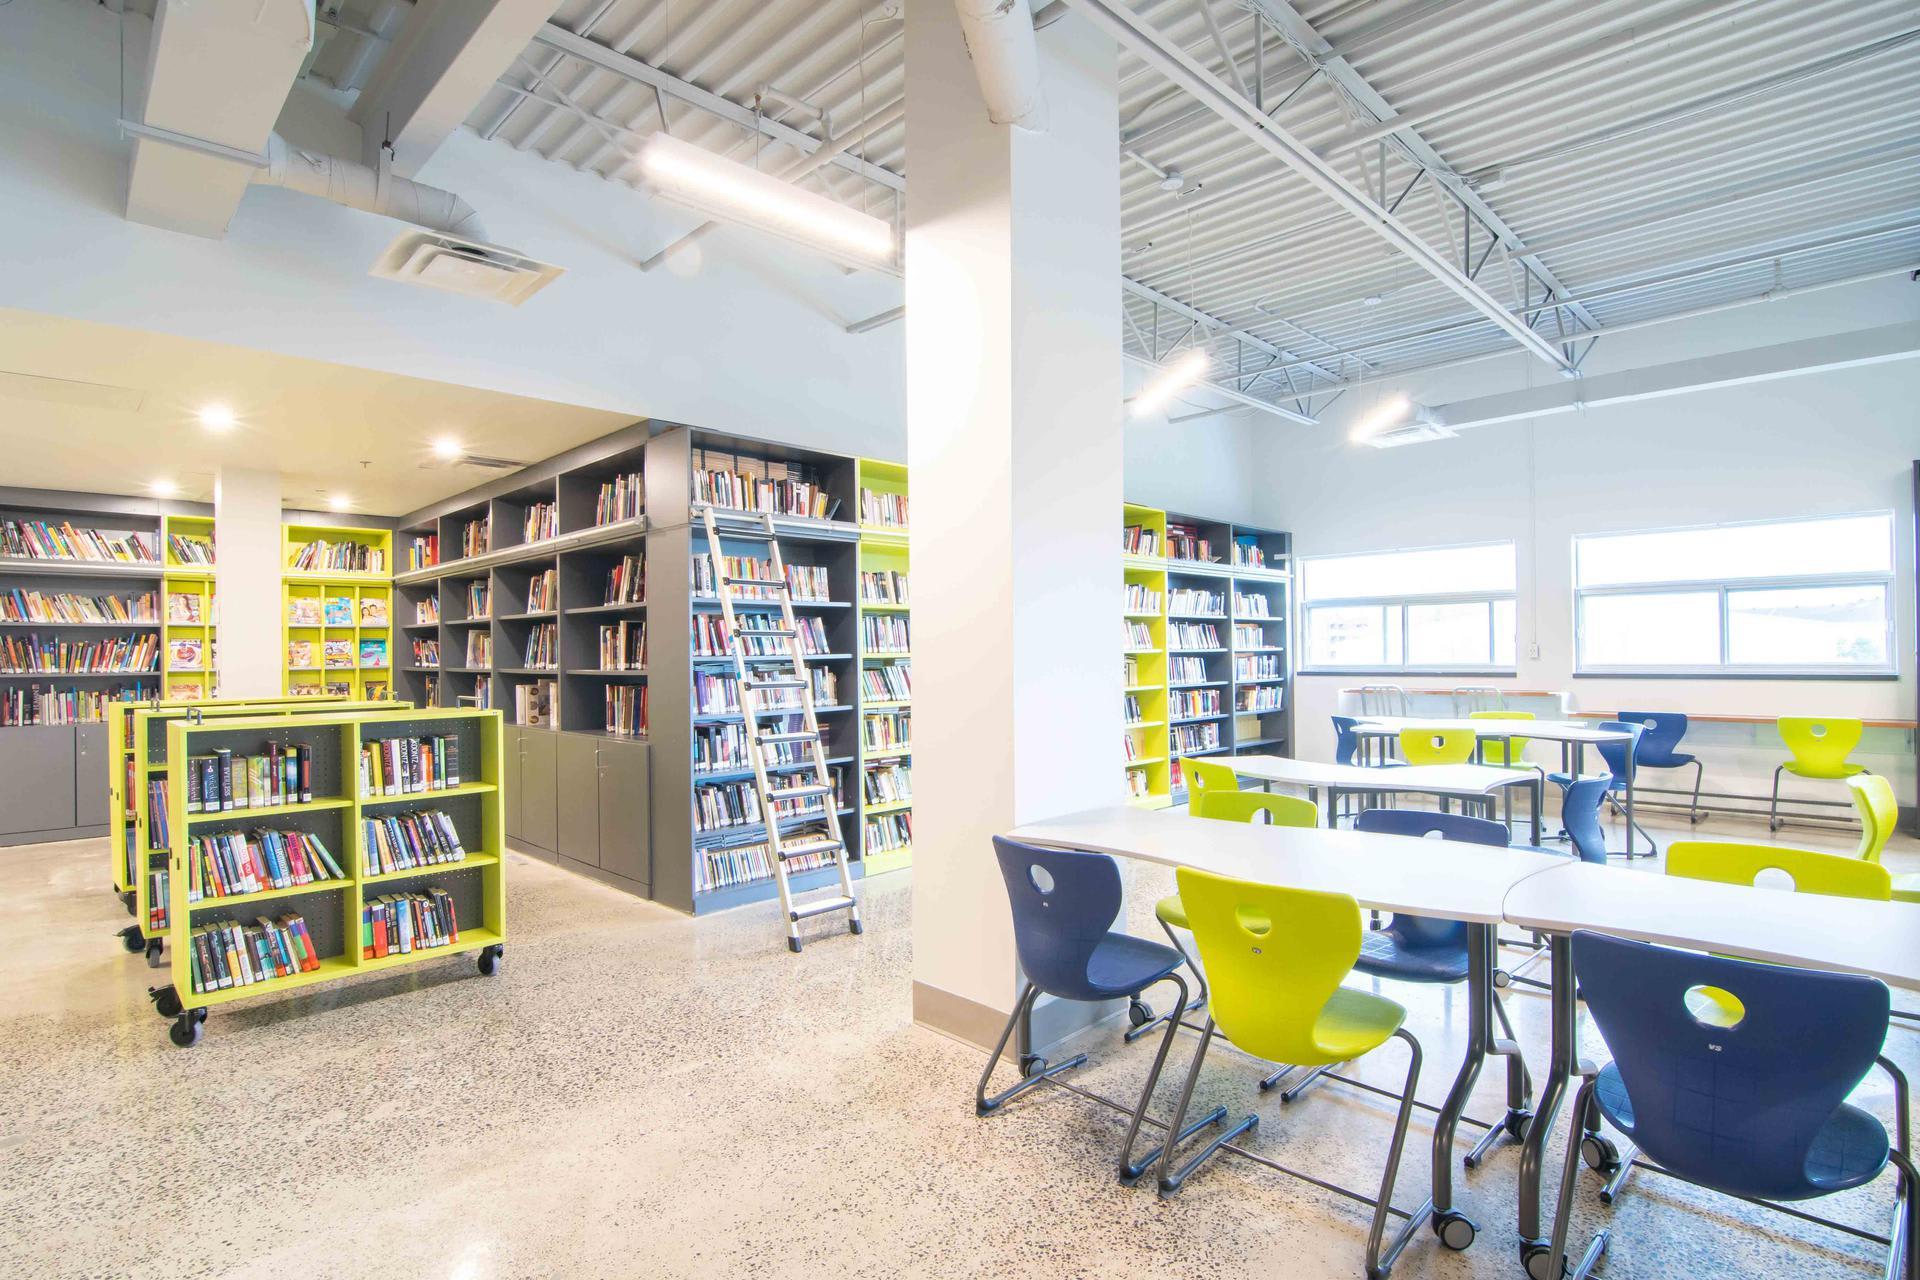 VS America: Transforming Your Library? - College Charles Lemoyne - QC